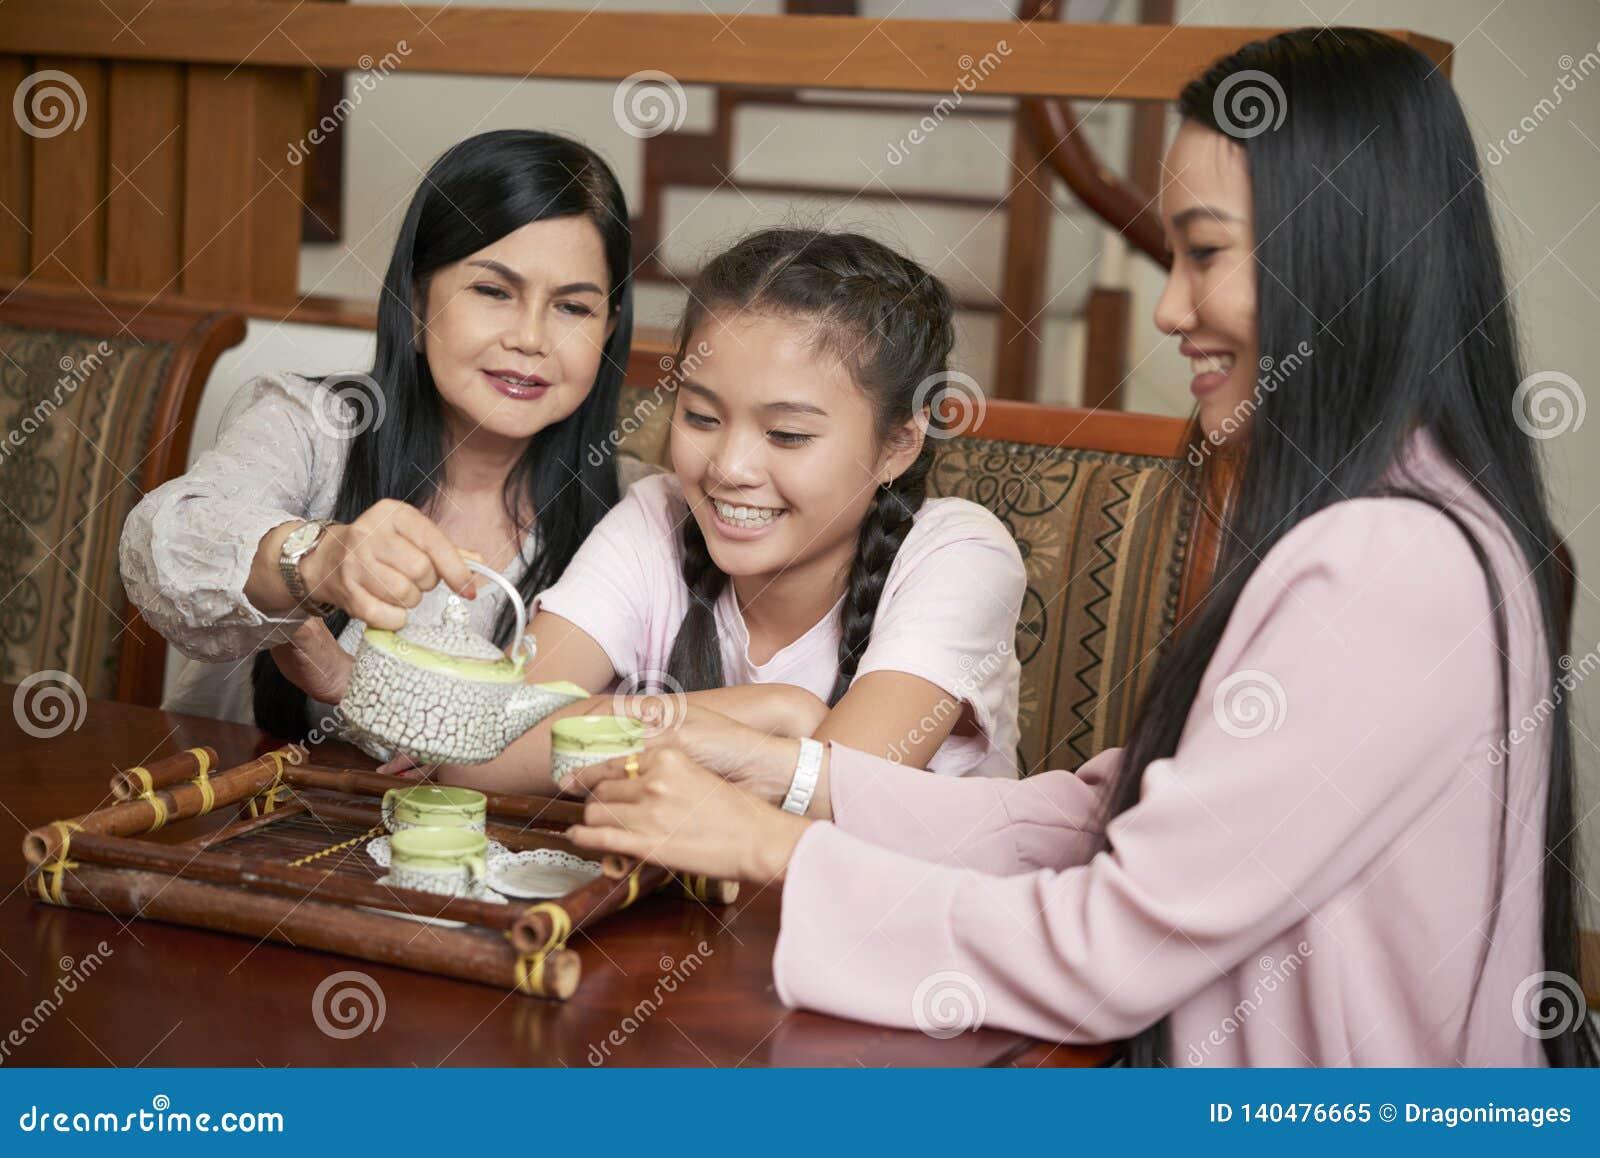 Happy Asian women of different generations having tea